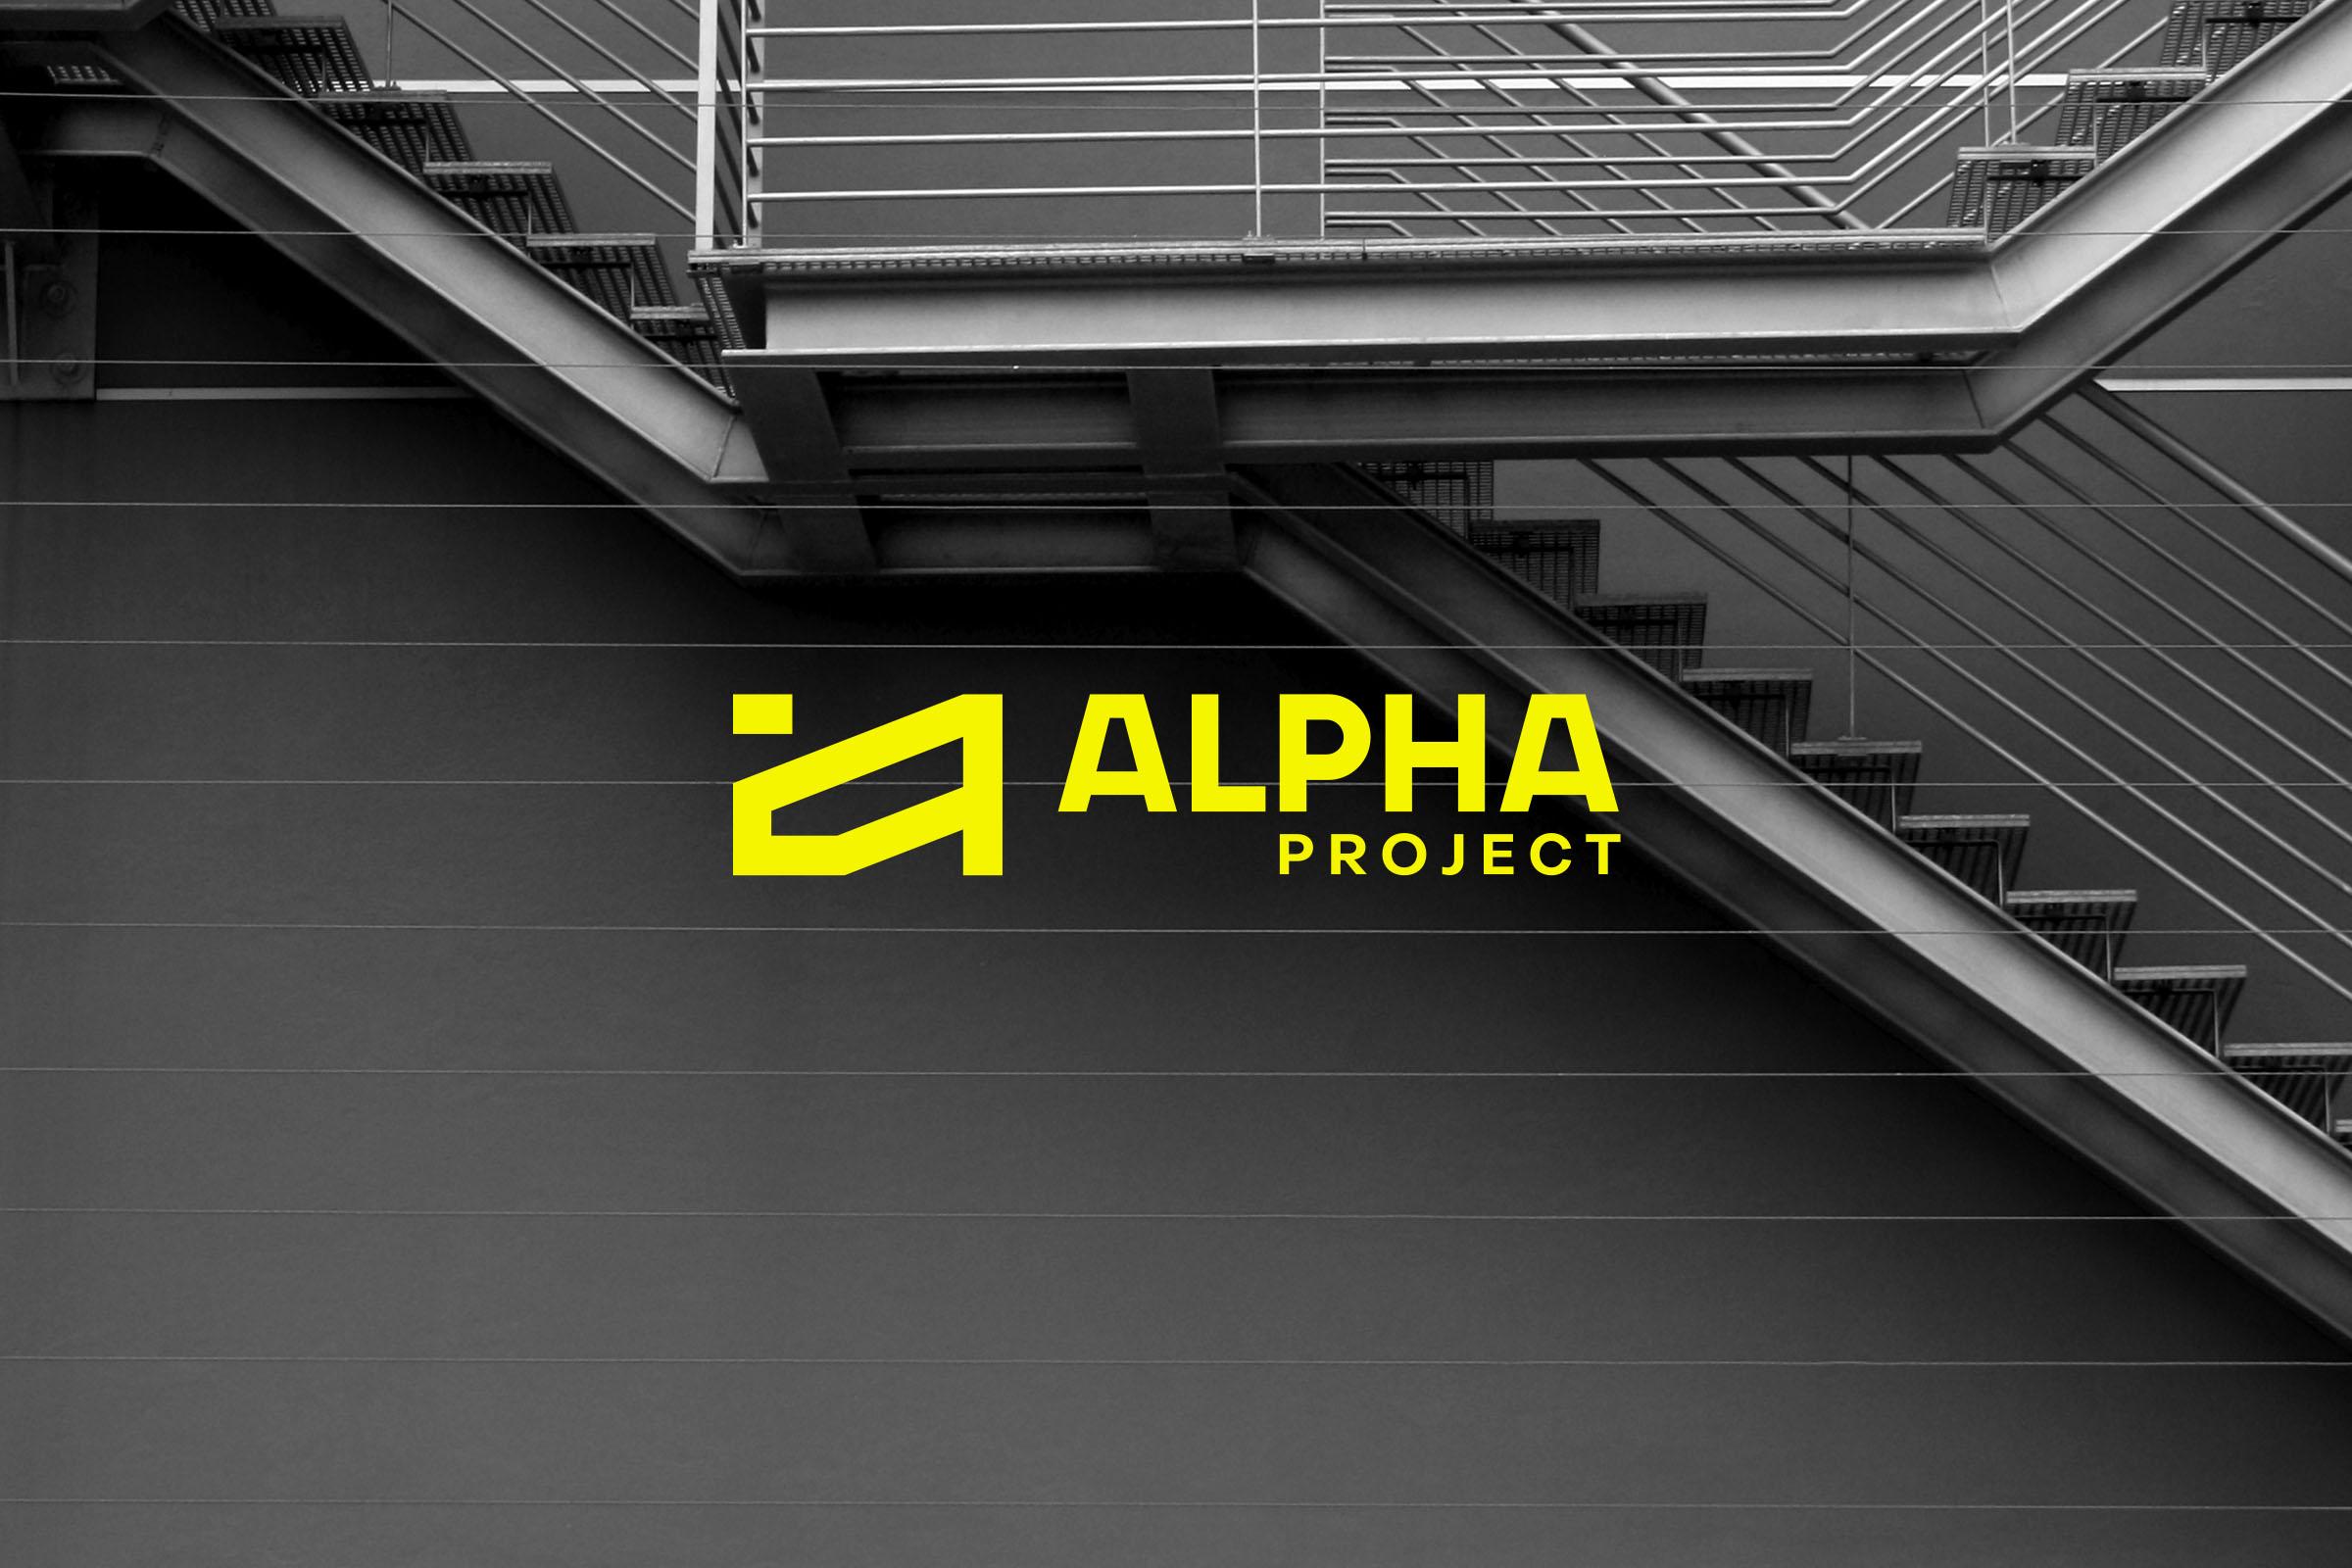 Alpha Project Constructions Design by Cursor Design Studio